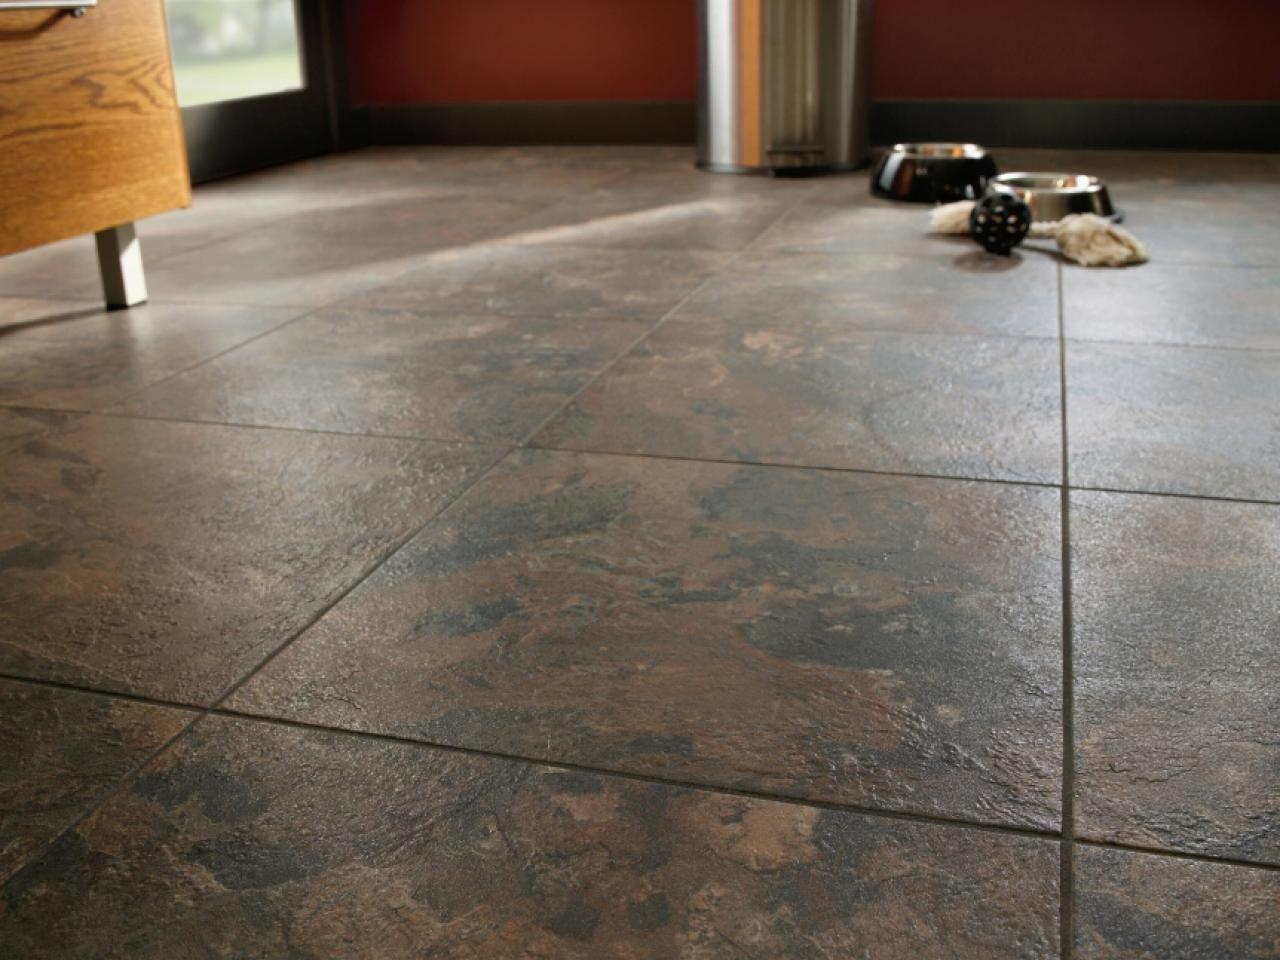 Explore Best Vinyl Flooring Tileore Laminate Floor That Looks Like Ceramic Tile